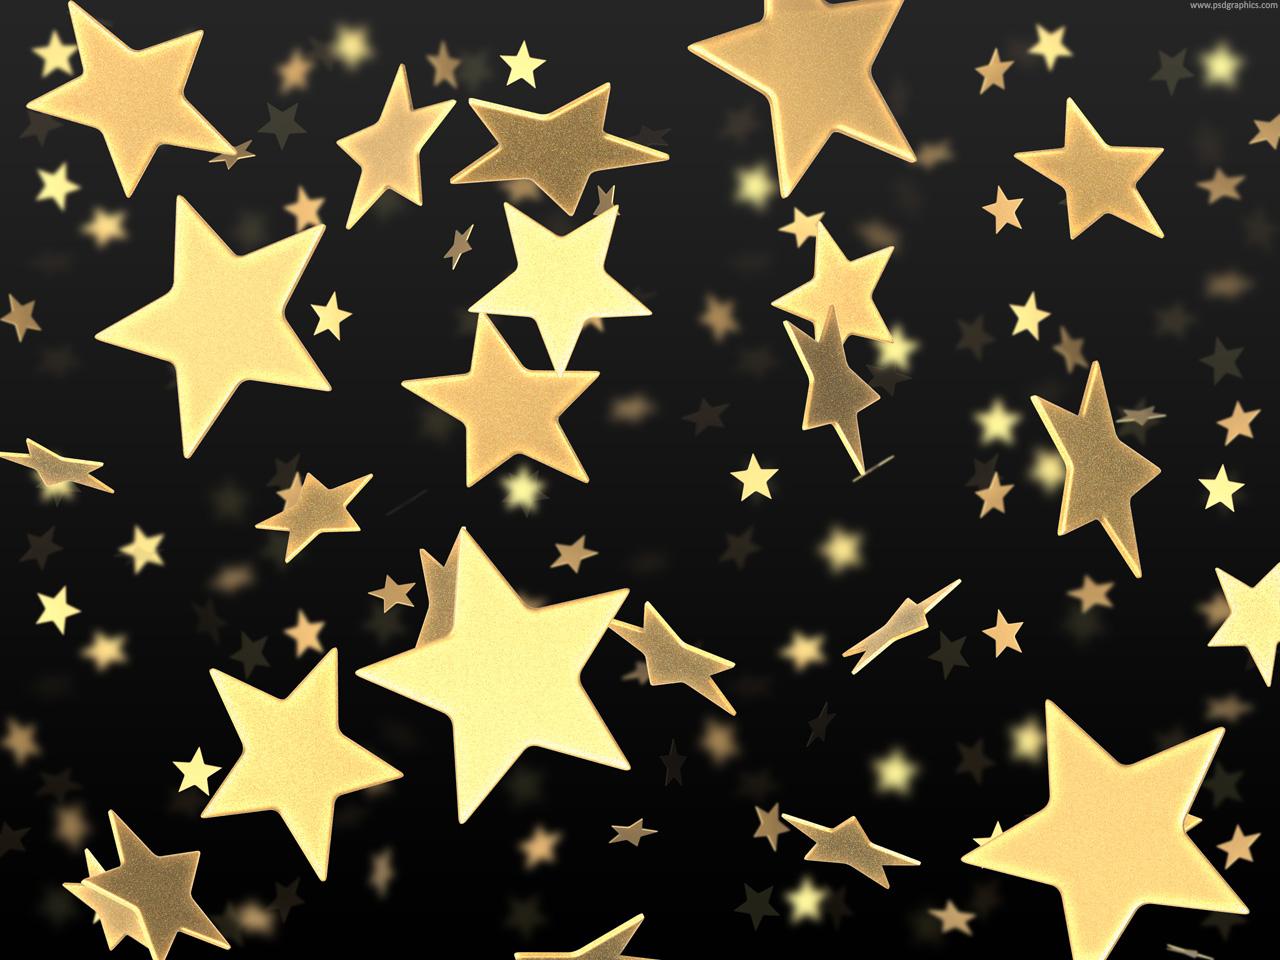 Medium size preview (1280x960px): Golden stars on black